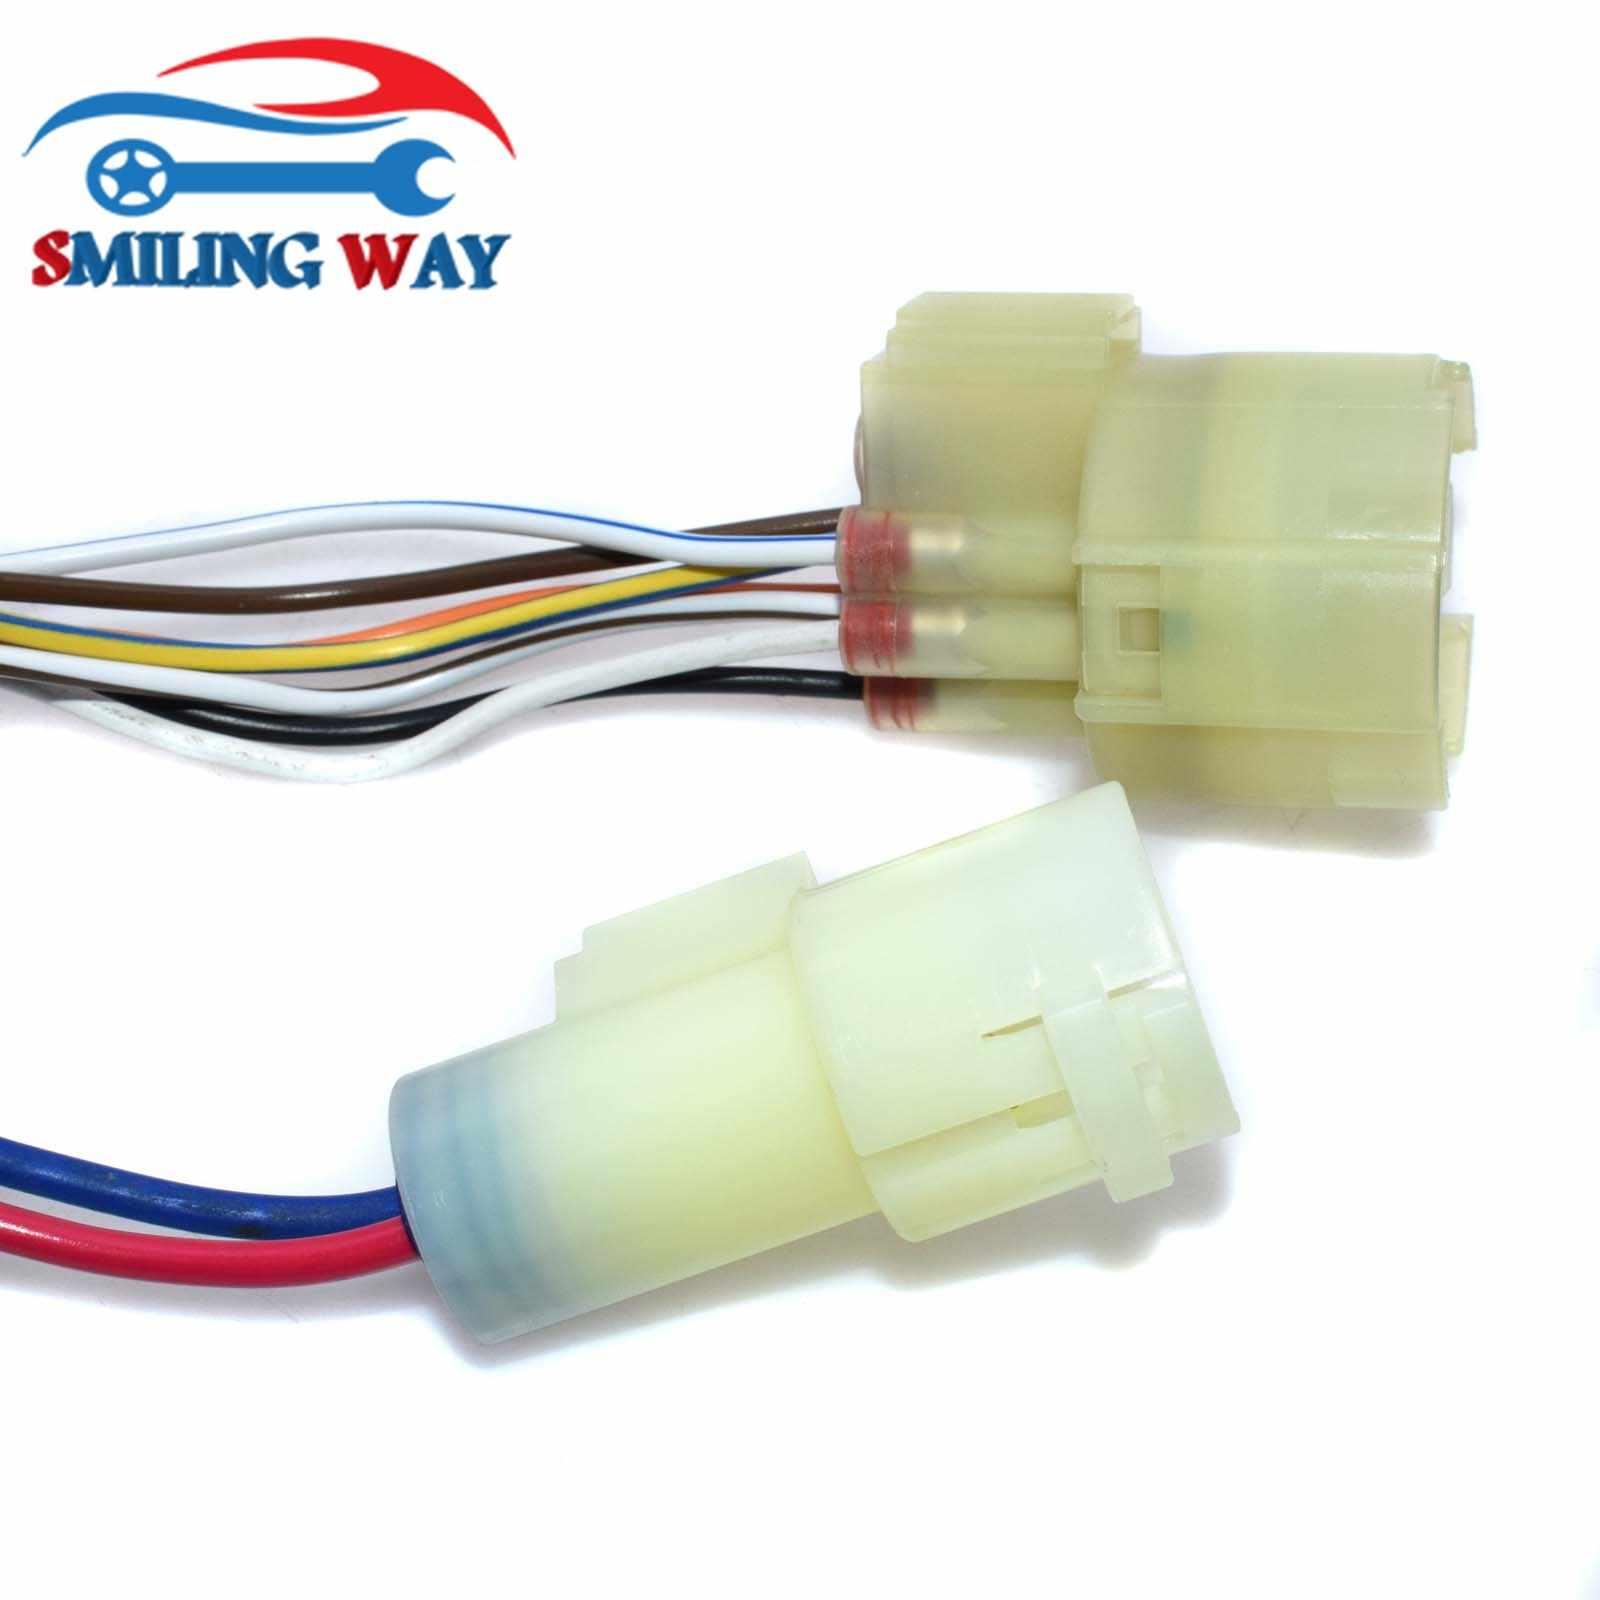 [SCHEMATICS_4FD]  OBD0 to OBD1 ECU Distributor Adaptor Connector Wire Harness Cable For Honda  CRX Civic Prelude Acura Integra B17 B16 B18 B20| | - AliExpress | B17 Wiring Harness |  | AliExpress